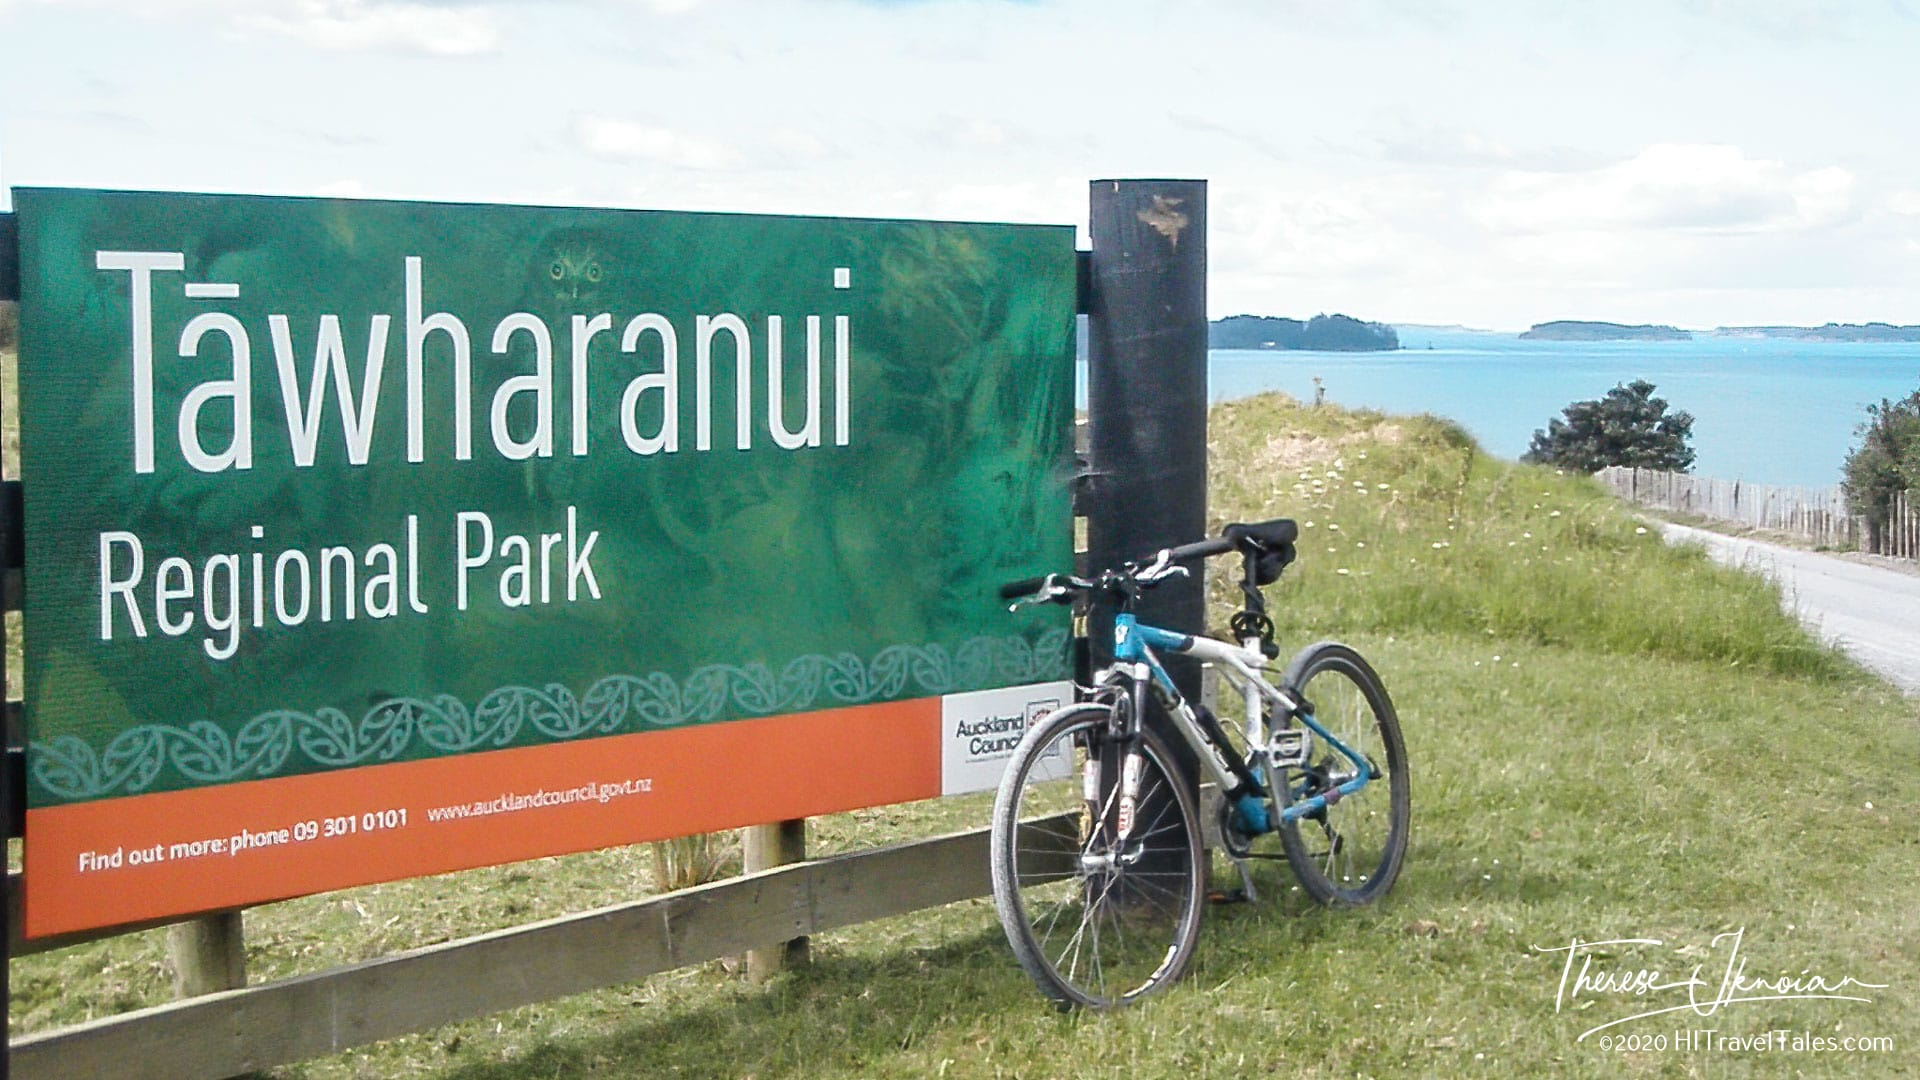 Tawharanui Regional Park Sign With Bike